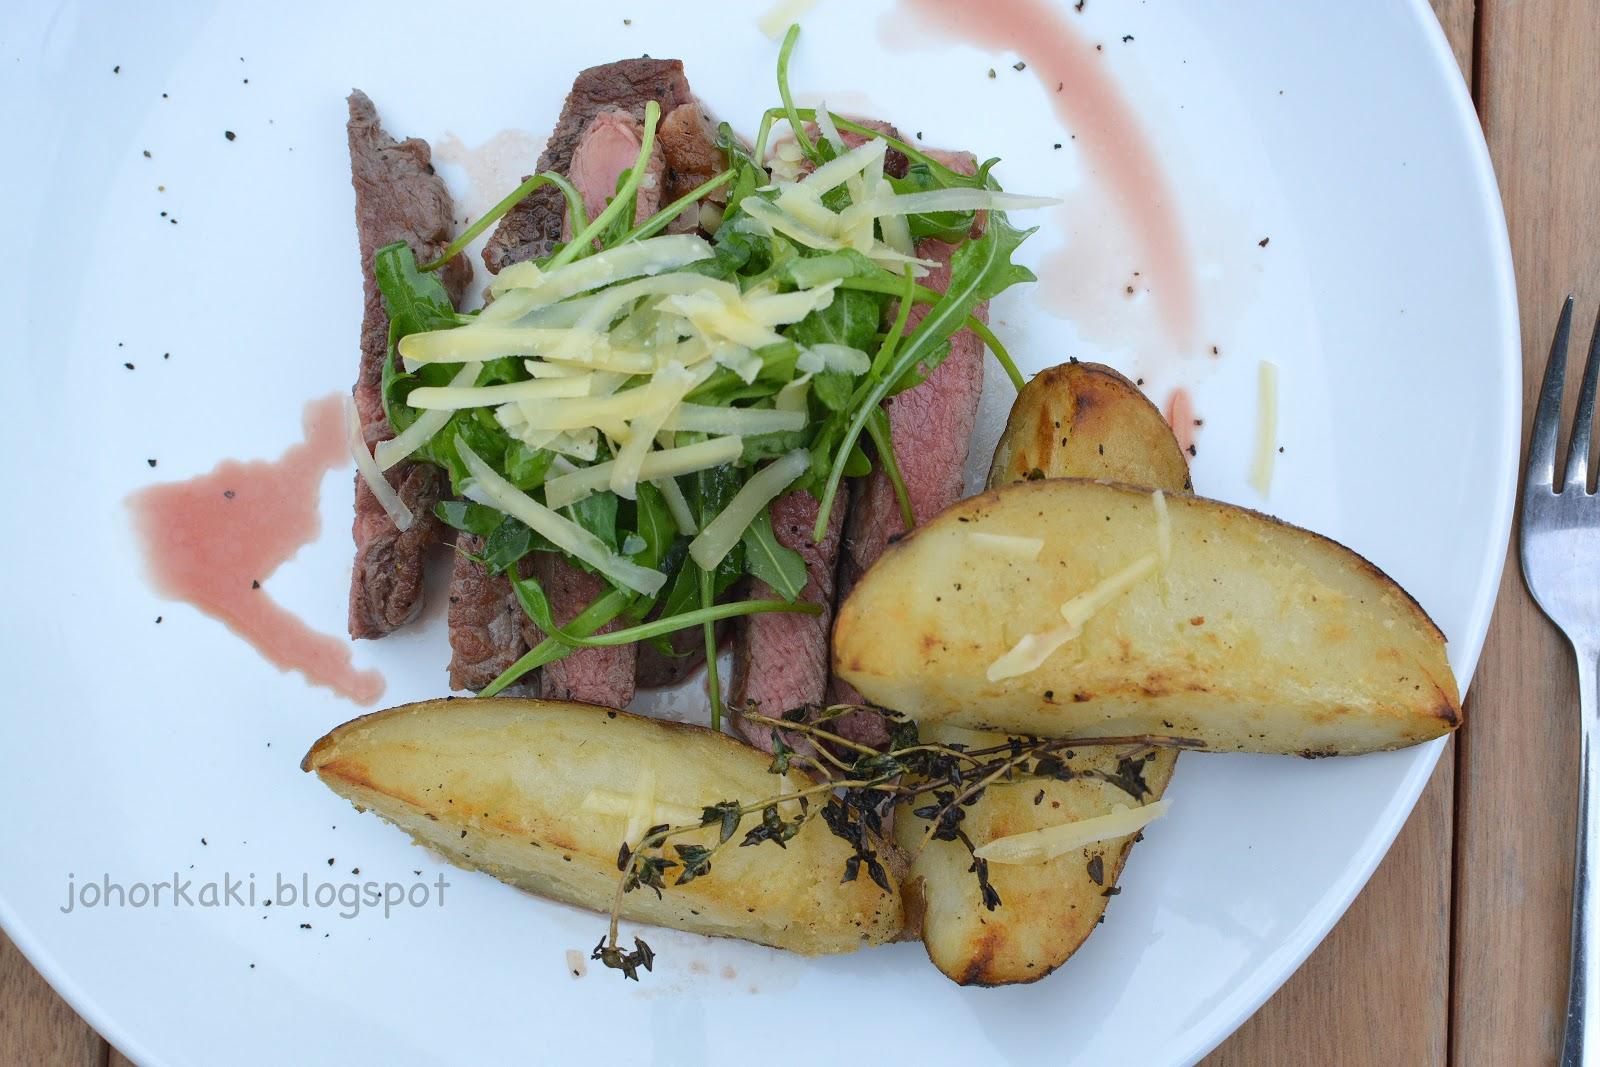 Beef tagliata (Italian sliced steak) with arugula (rocket), thyme, G ...